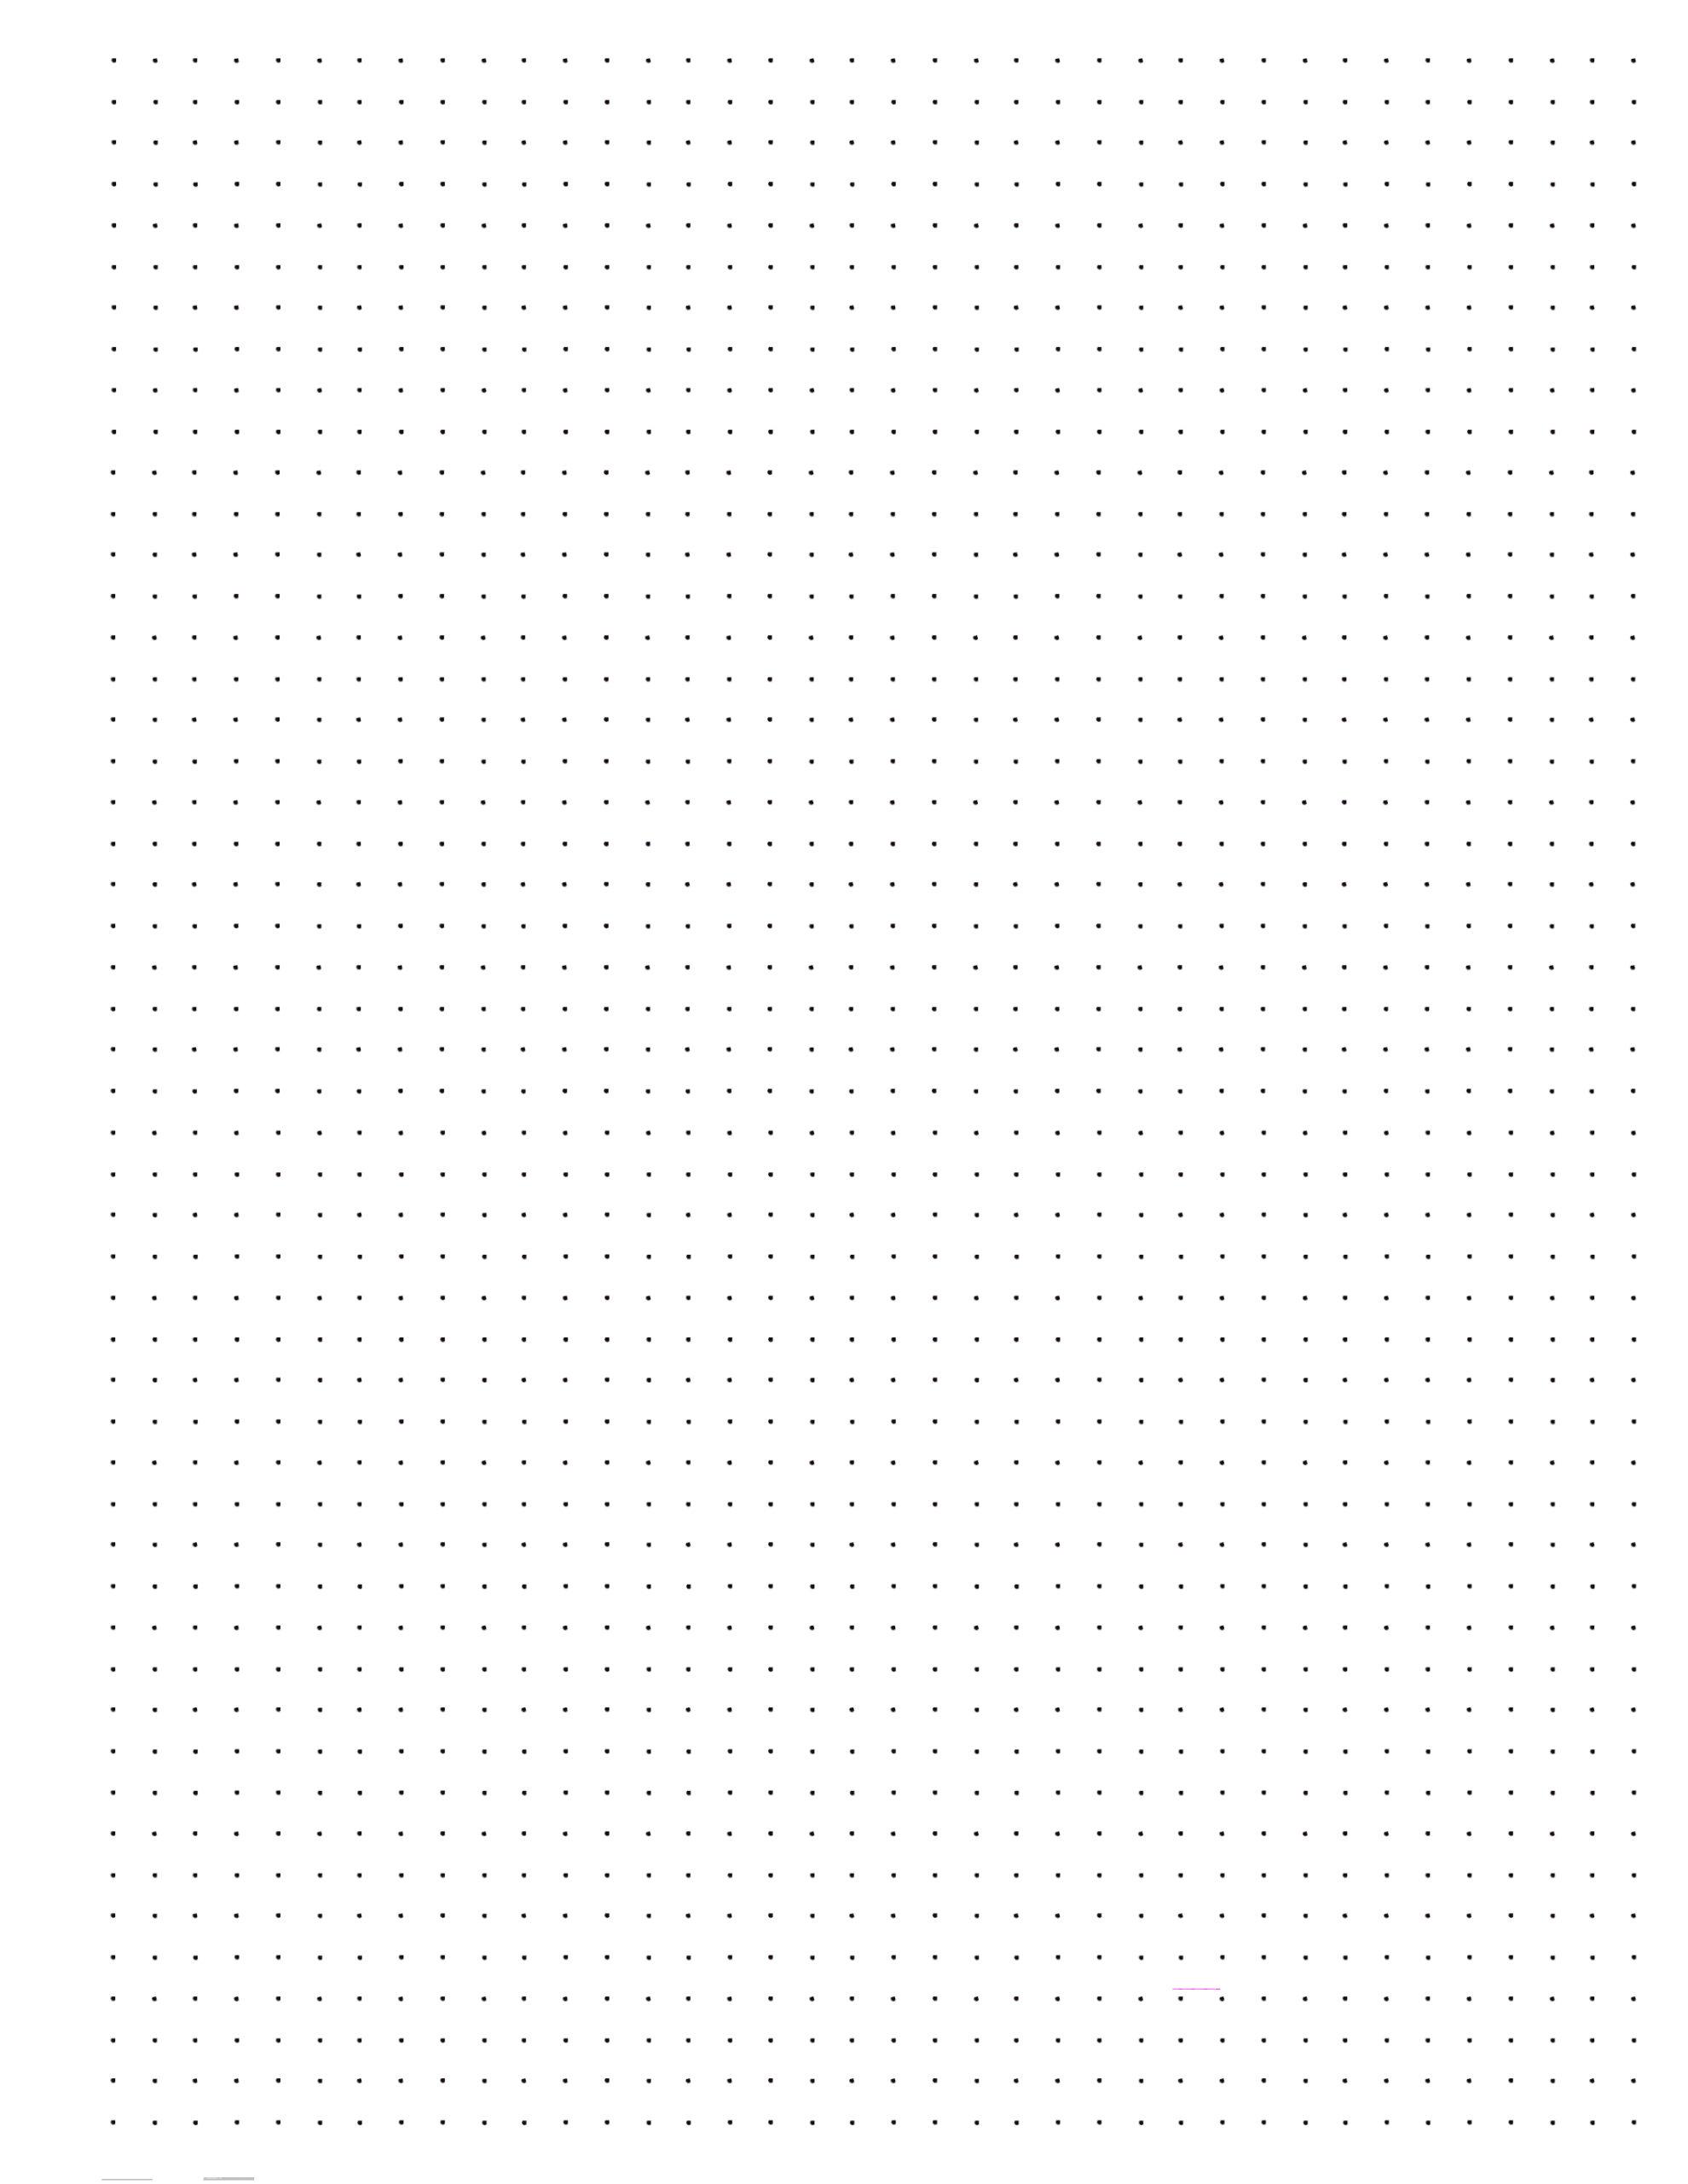 Happy Planner Dot Grid Paper Free Printable